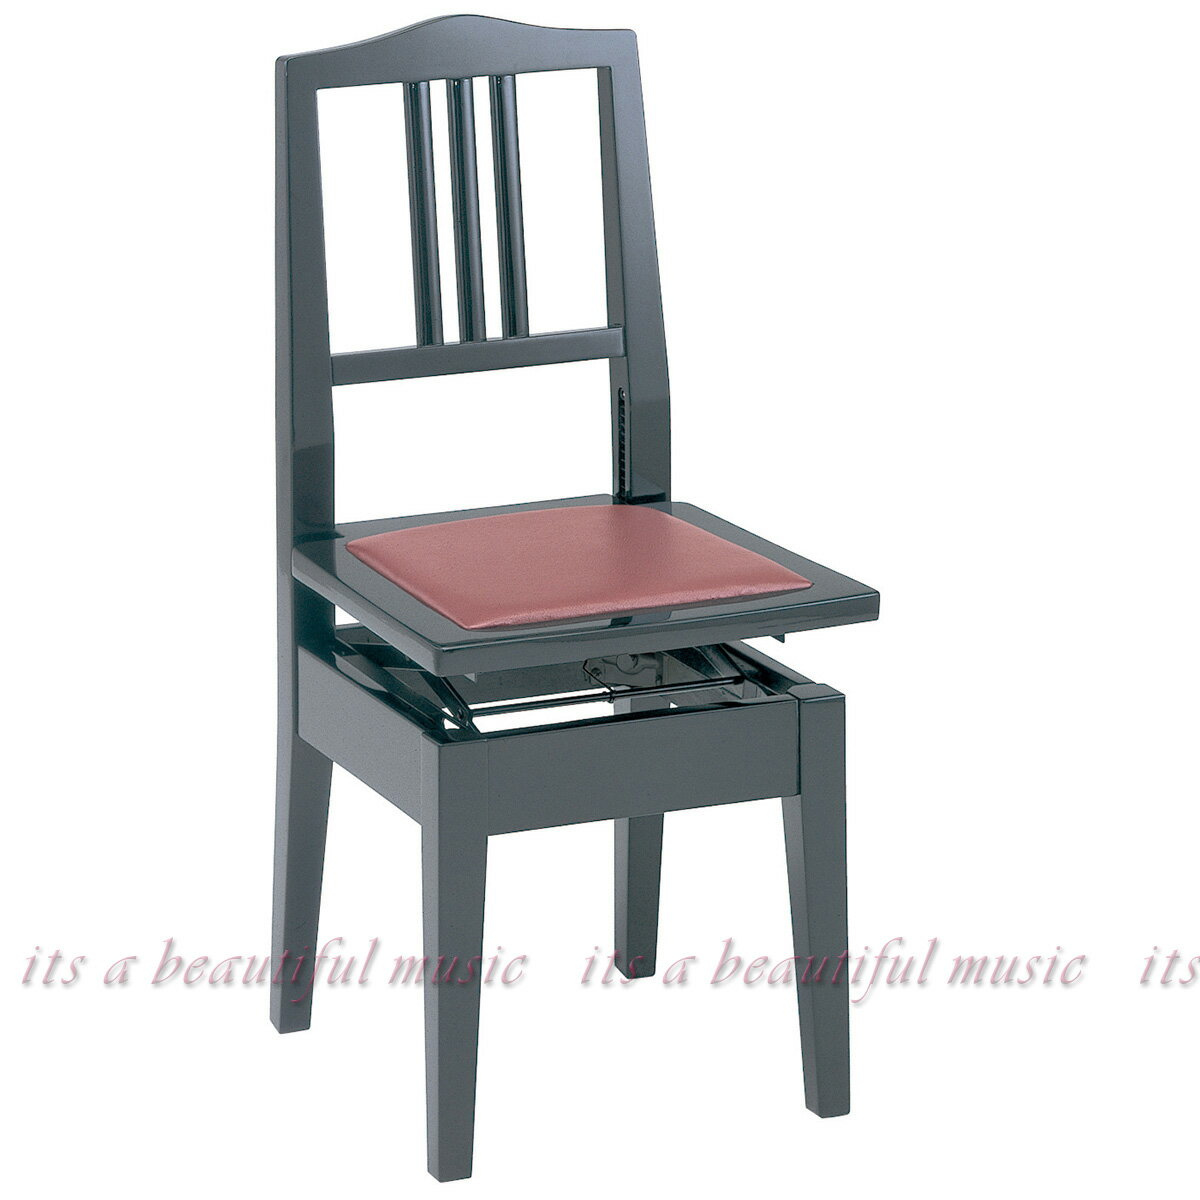 【its】お求めやすい!背もたれピアノ椅子(トムソン椅子)・甲南Konan No.6(No6)黒色